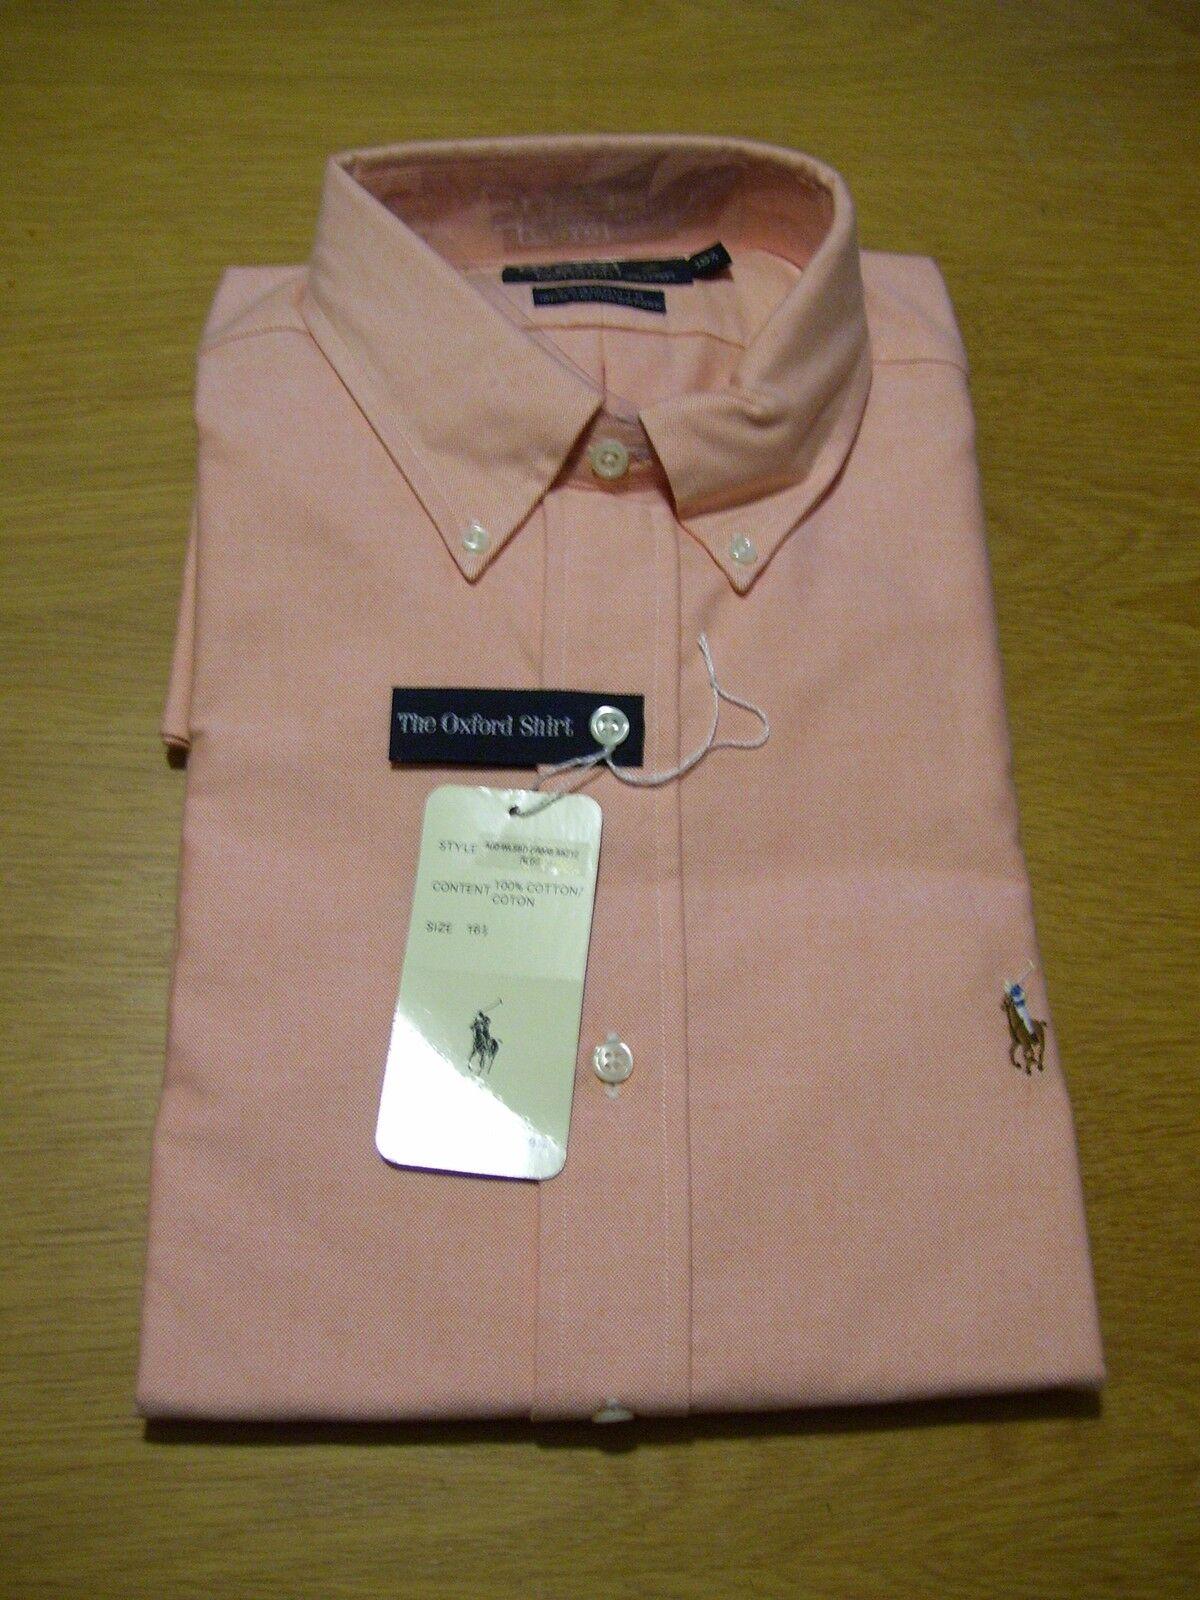 Polo by Ralph Lauren Hemd Oxford Langarm Lachs Apricot Gr L 16 1/2  neu